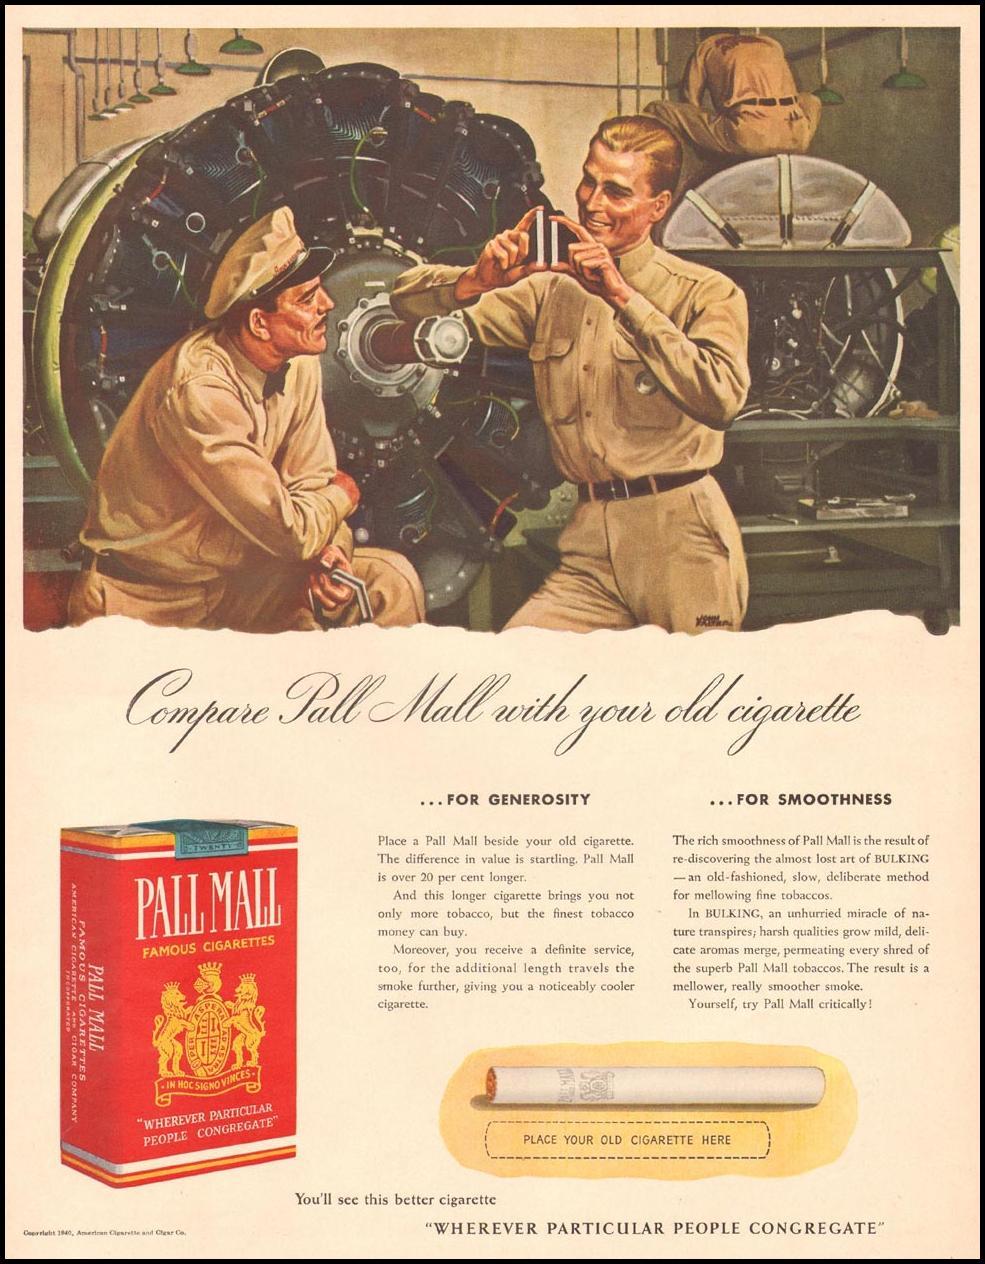 PALL MALL CIGARETTES LIFE 12/16/1940 p. 79